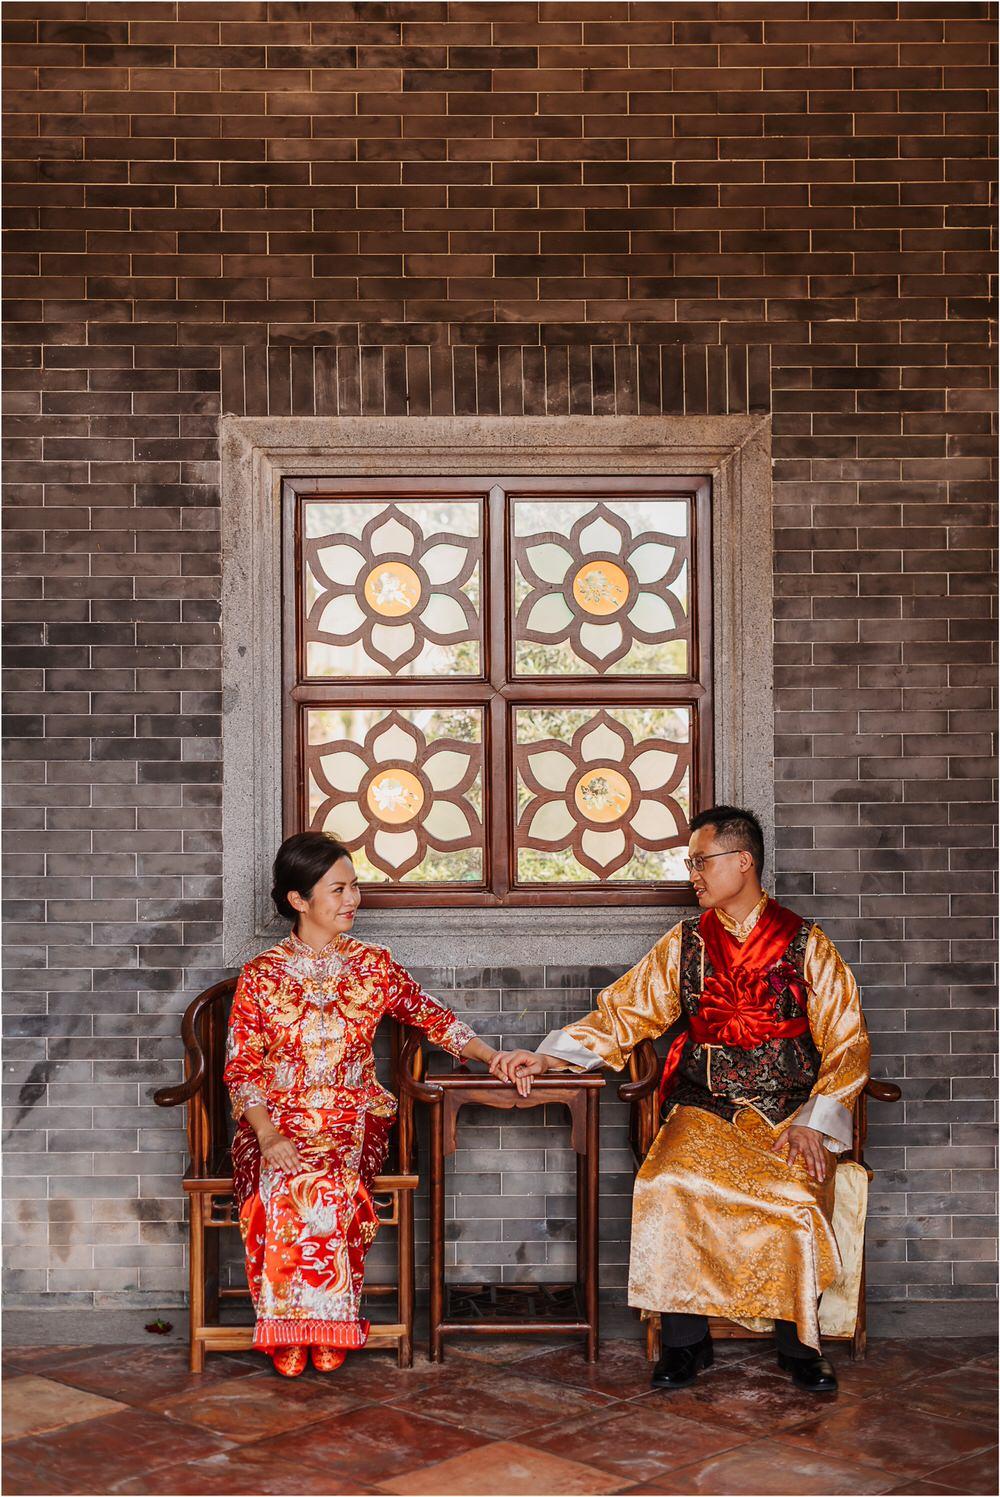 hong kong wedding photographer intercontinental kowloon chinese tea ceremony traditional wedding photography 0089.jpg